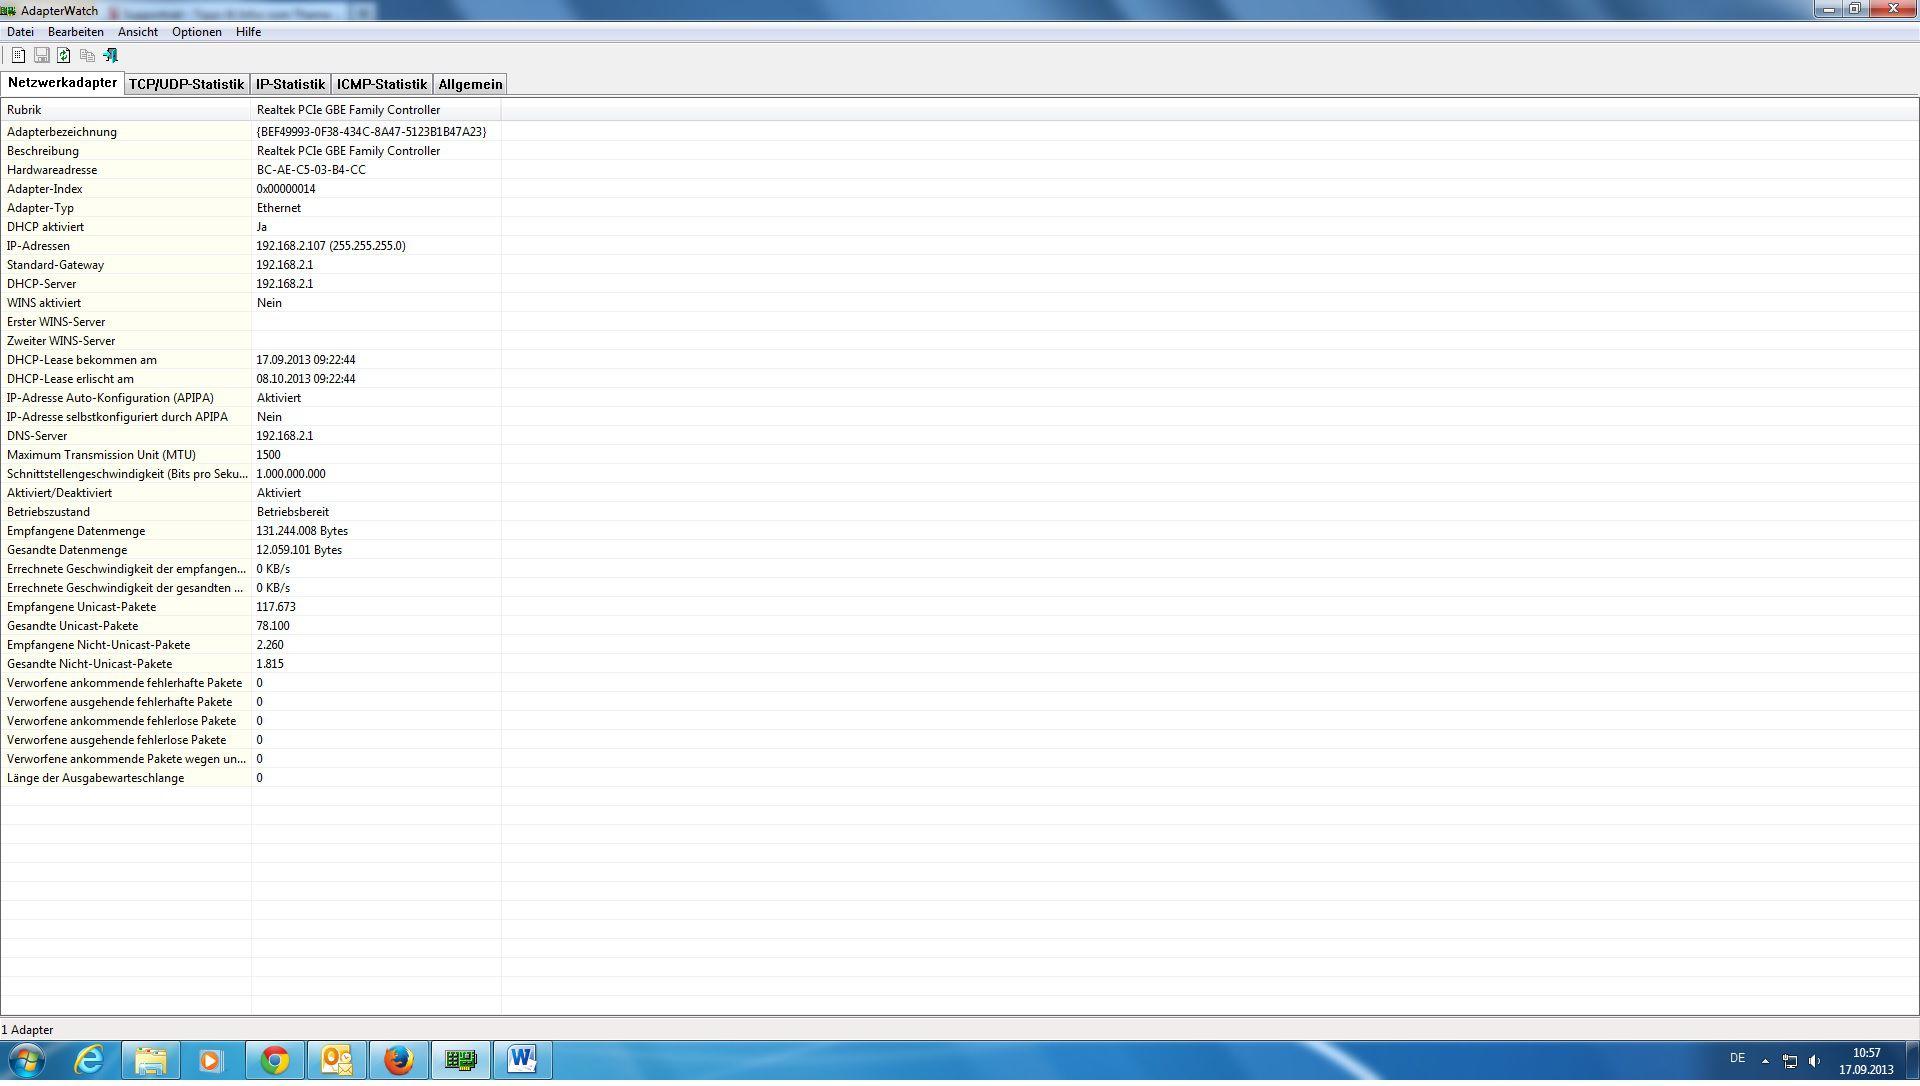 adapter_watch-470.jpg?nocache=1379412630370